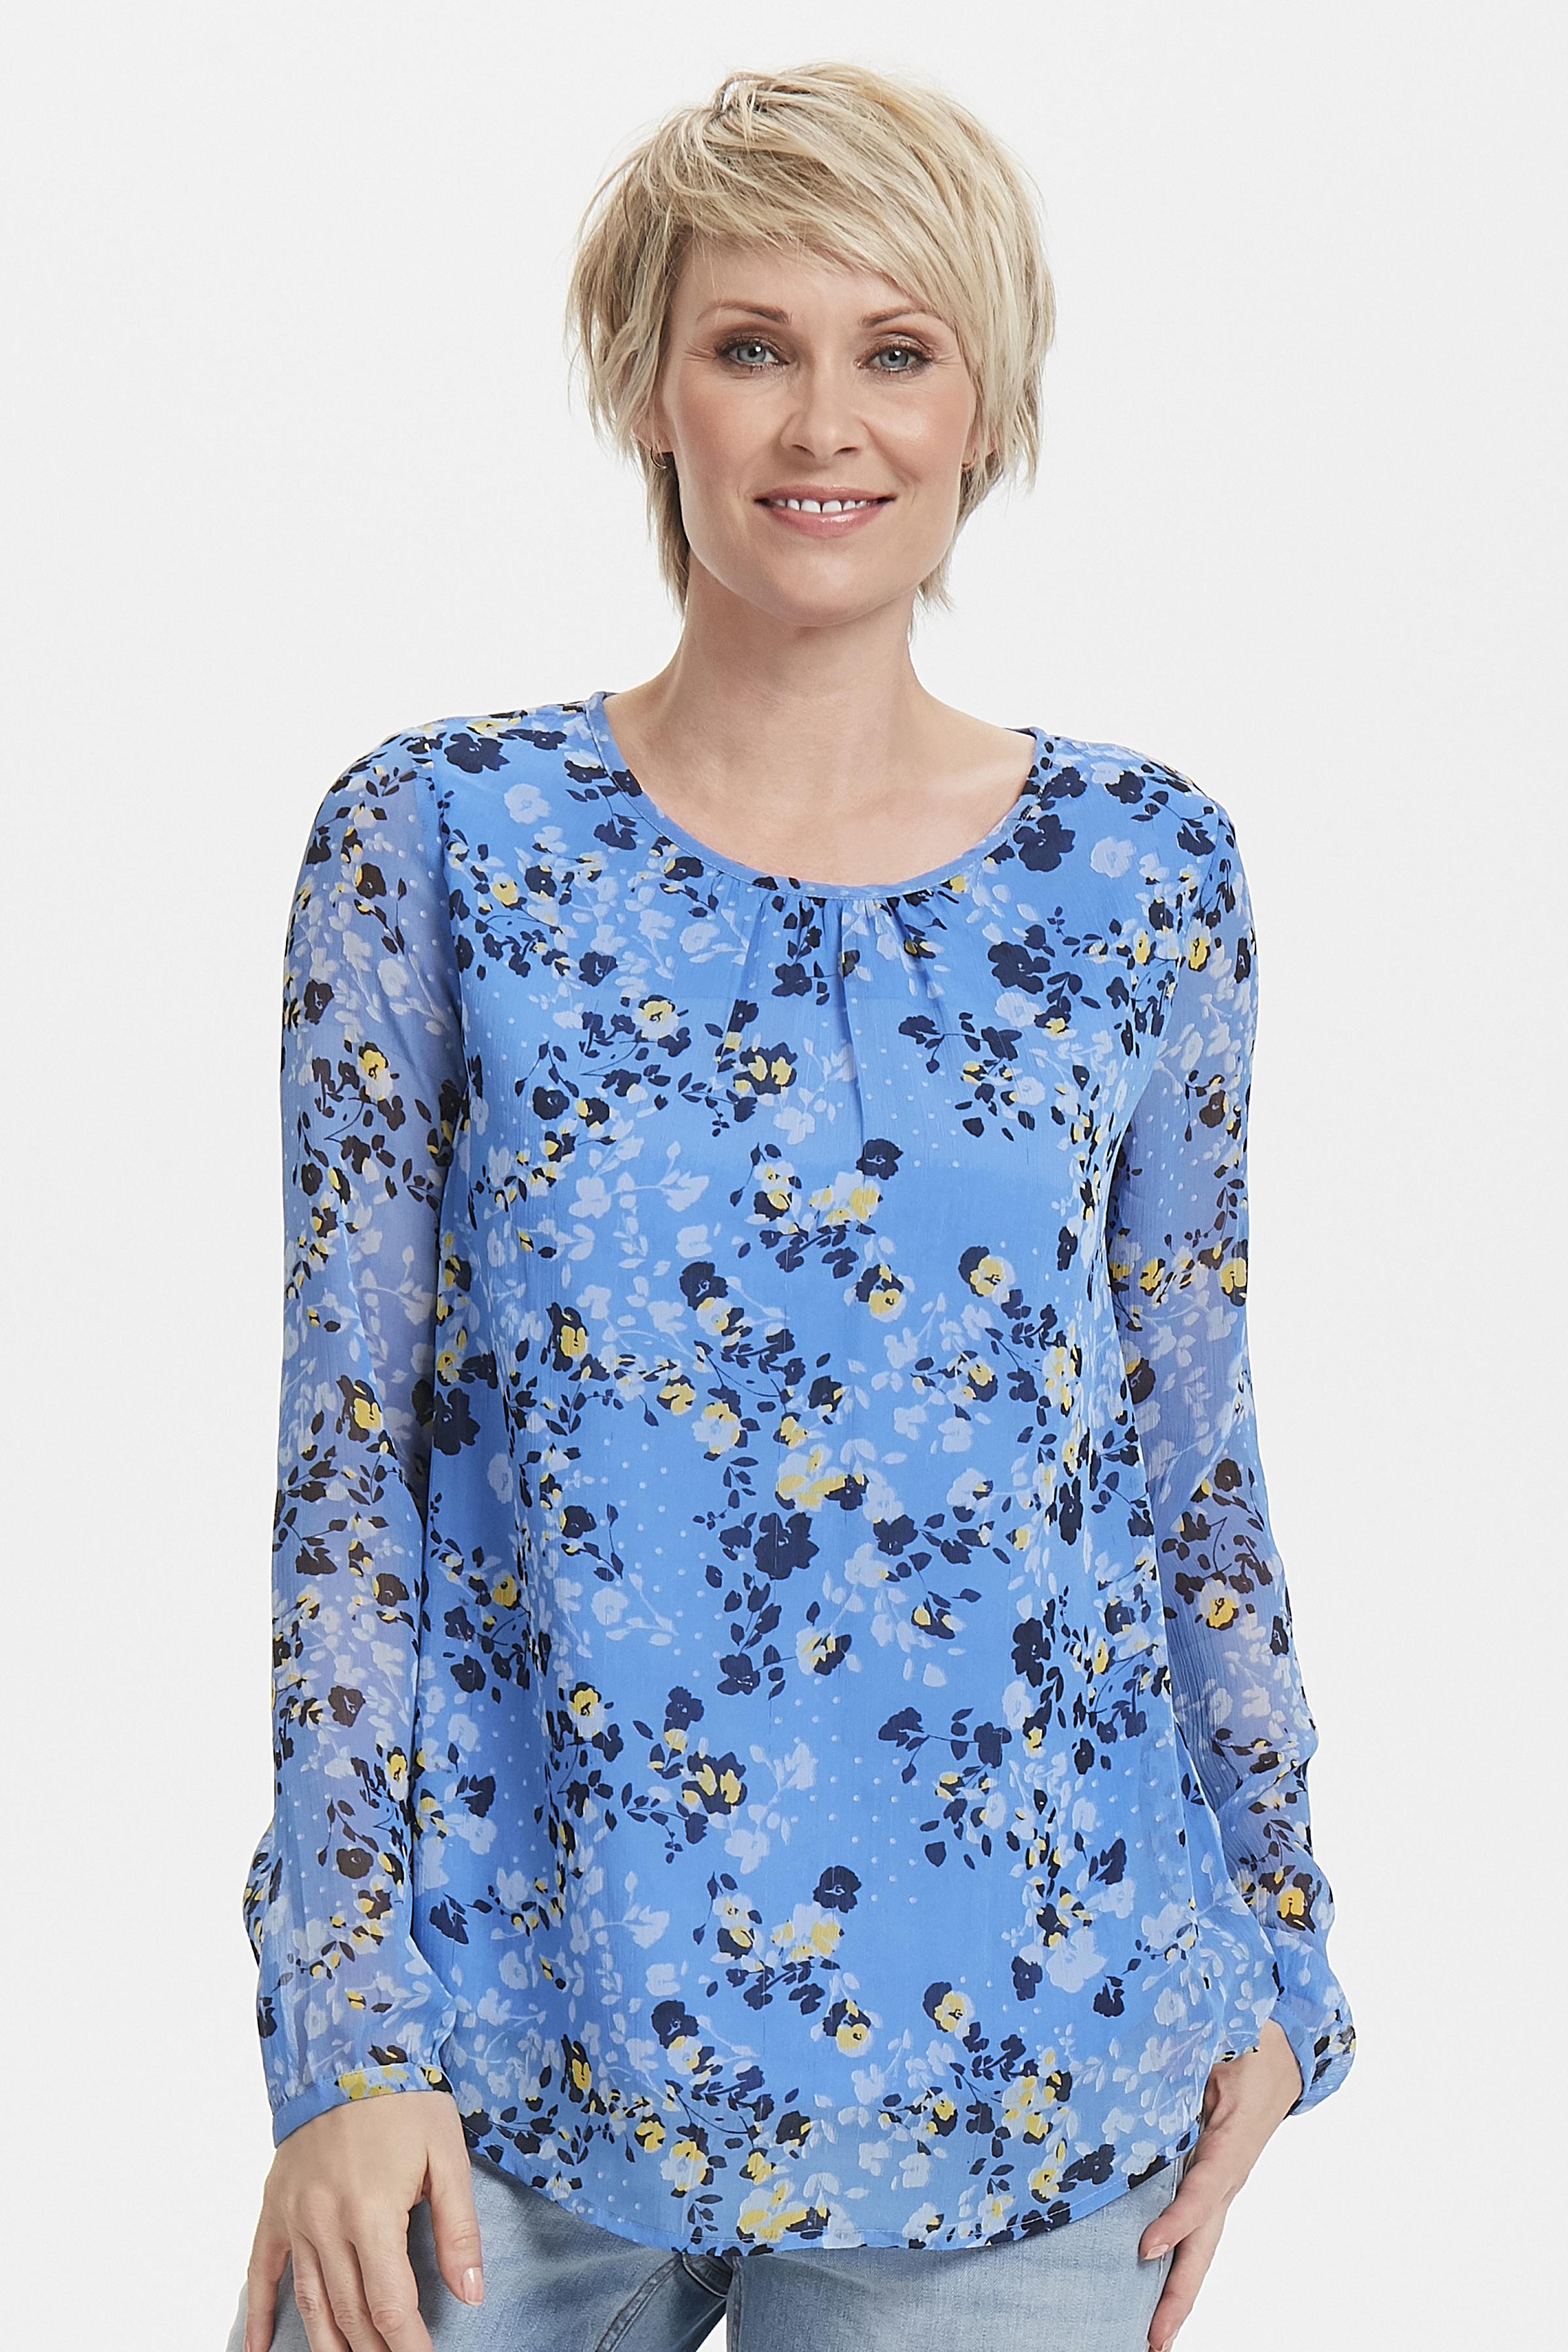 Dimblå/marinblå Långärmad blus från Fransa – Köp Dimblå/marinblå Långärmad blus från stl. XS-XXL här